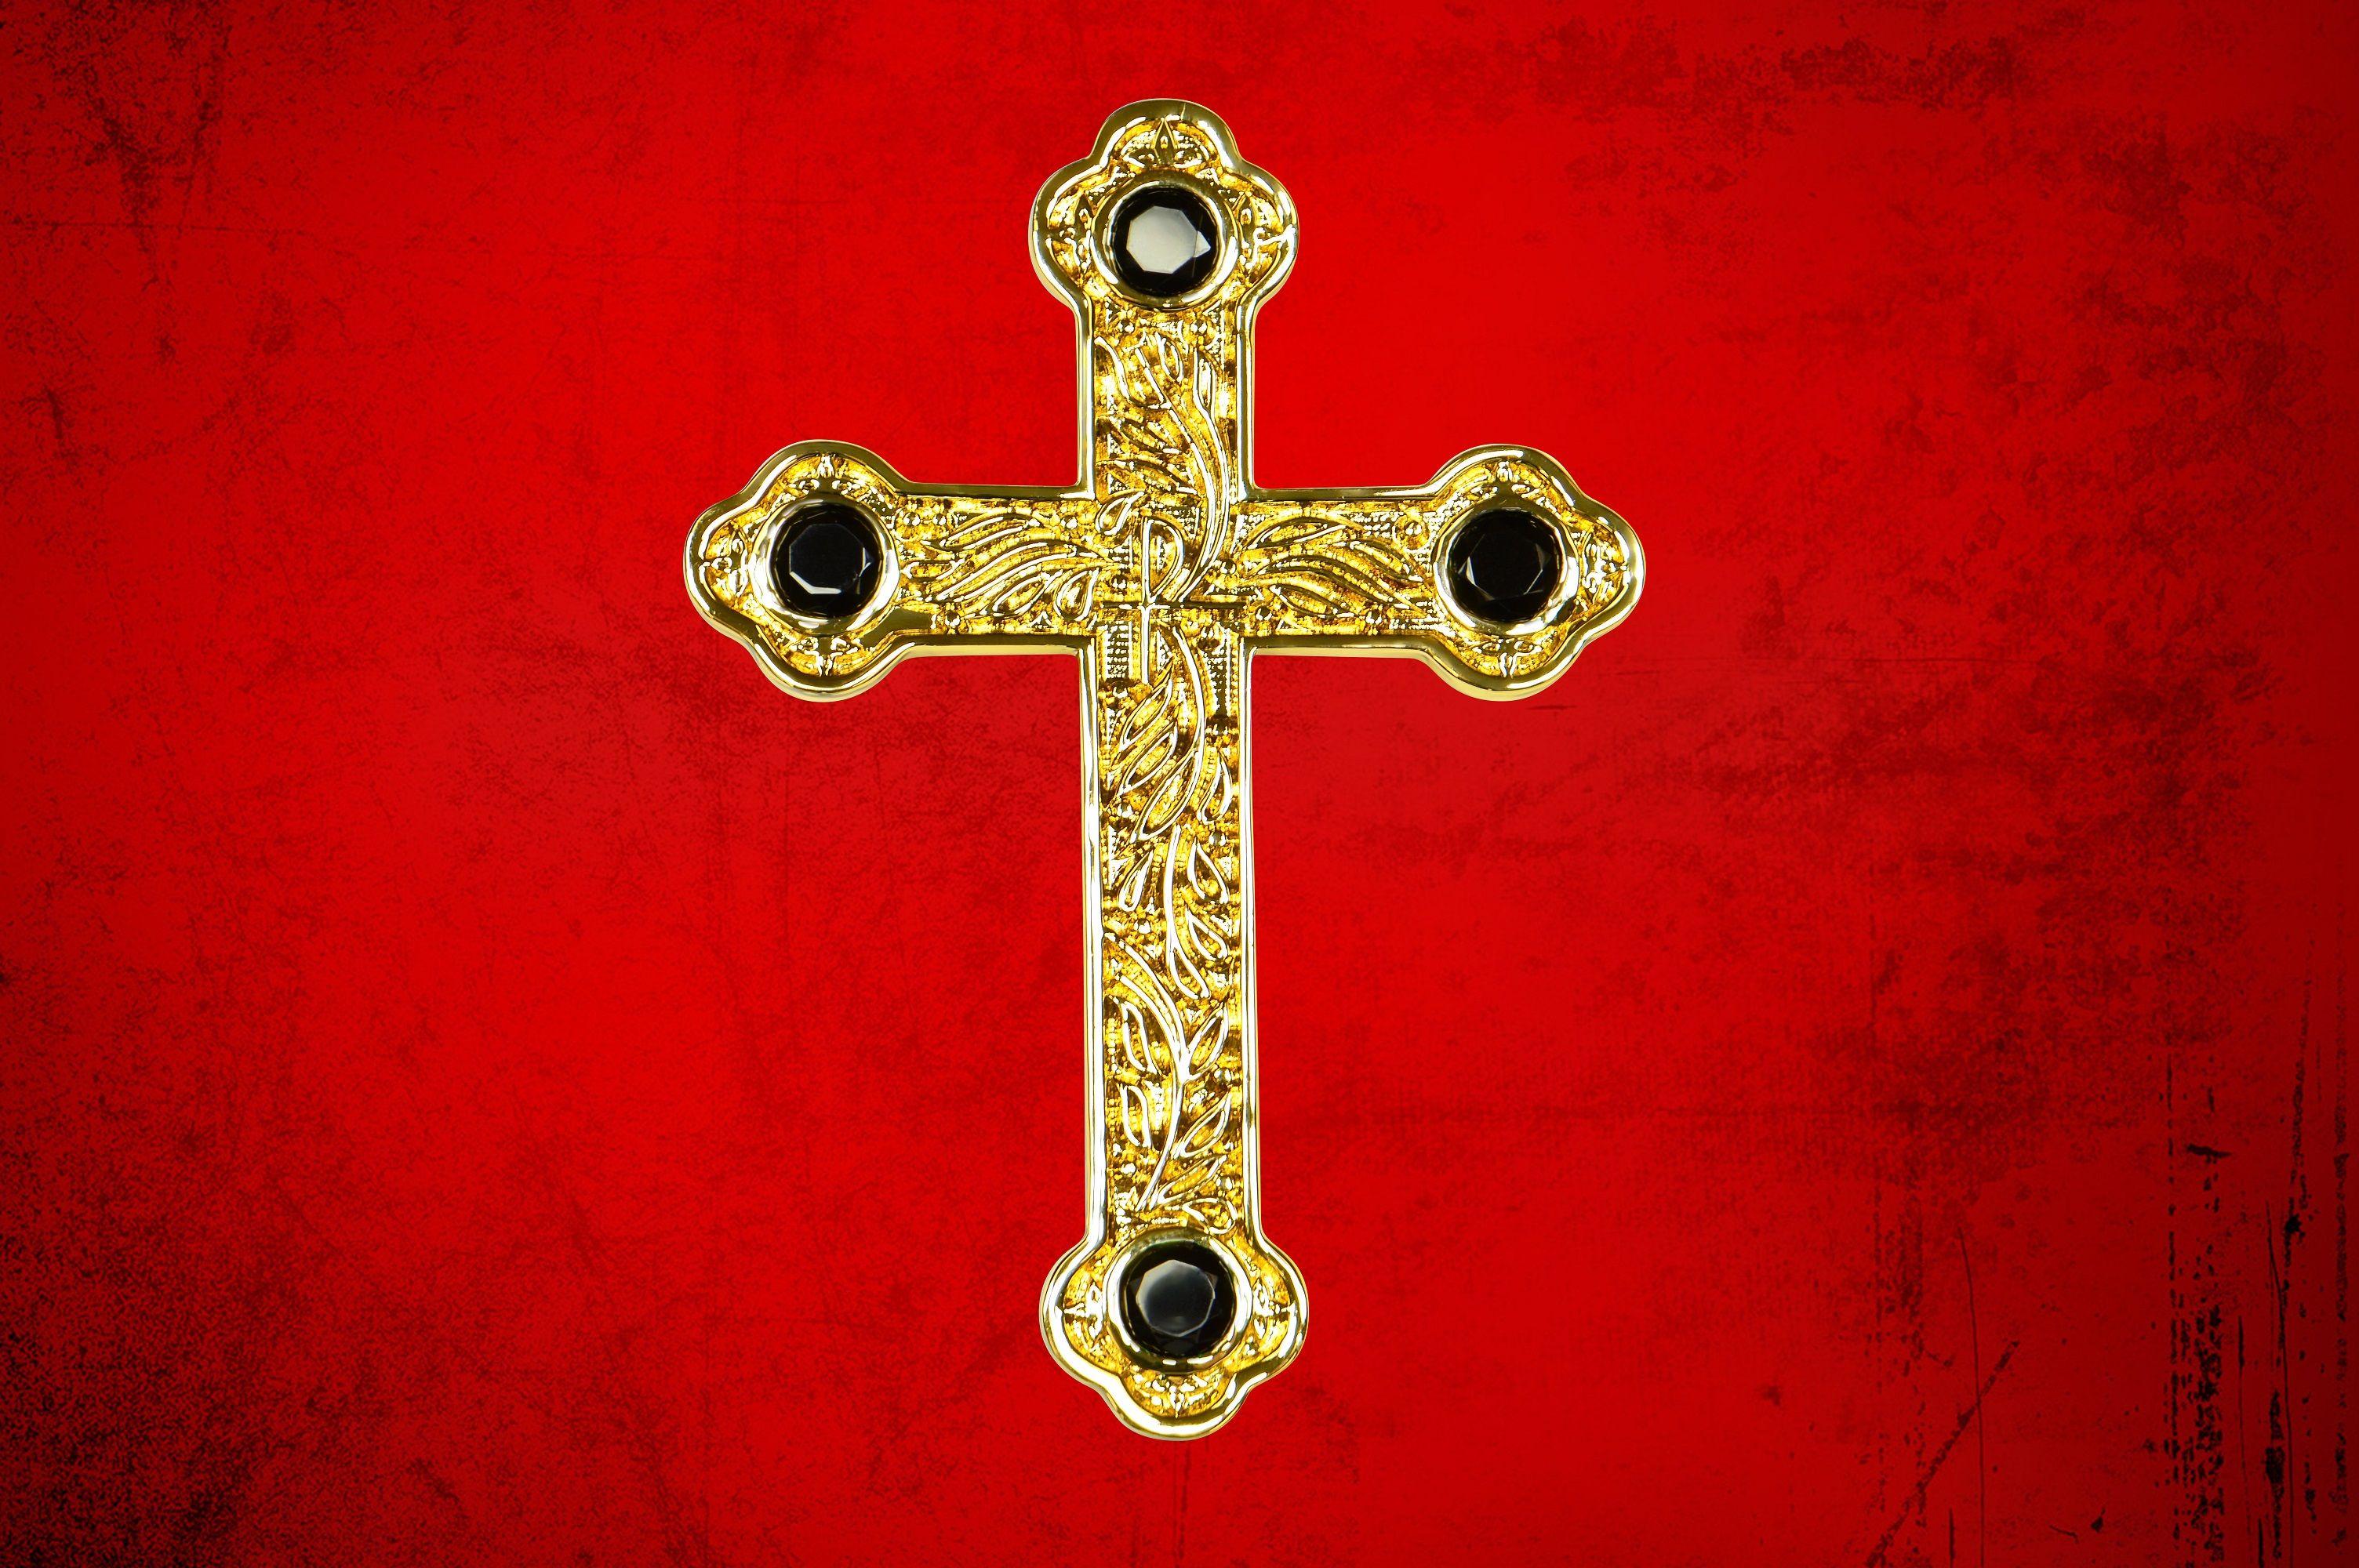 Premium Pectoral Cross Pendant & Chain Set with Black